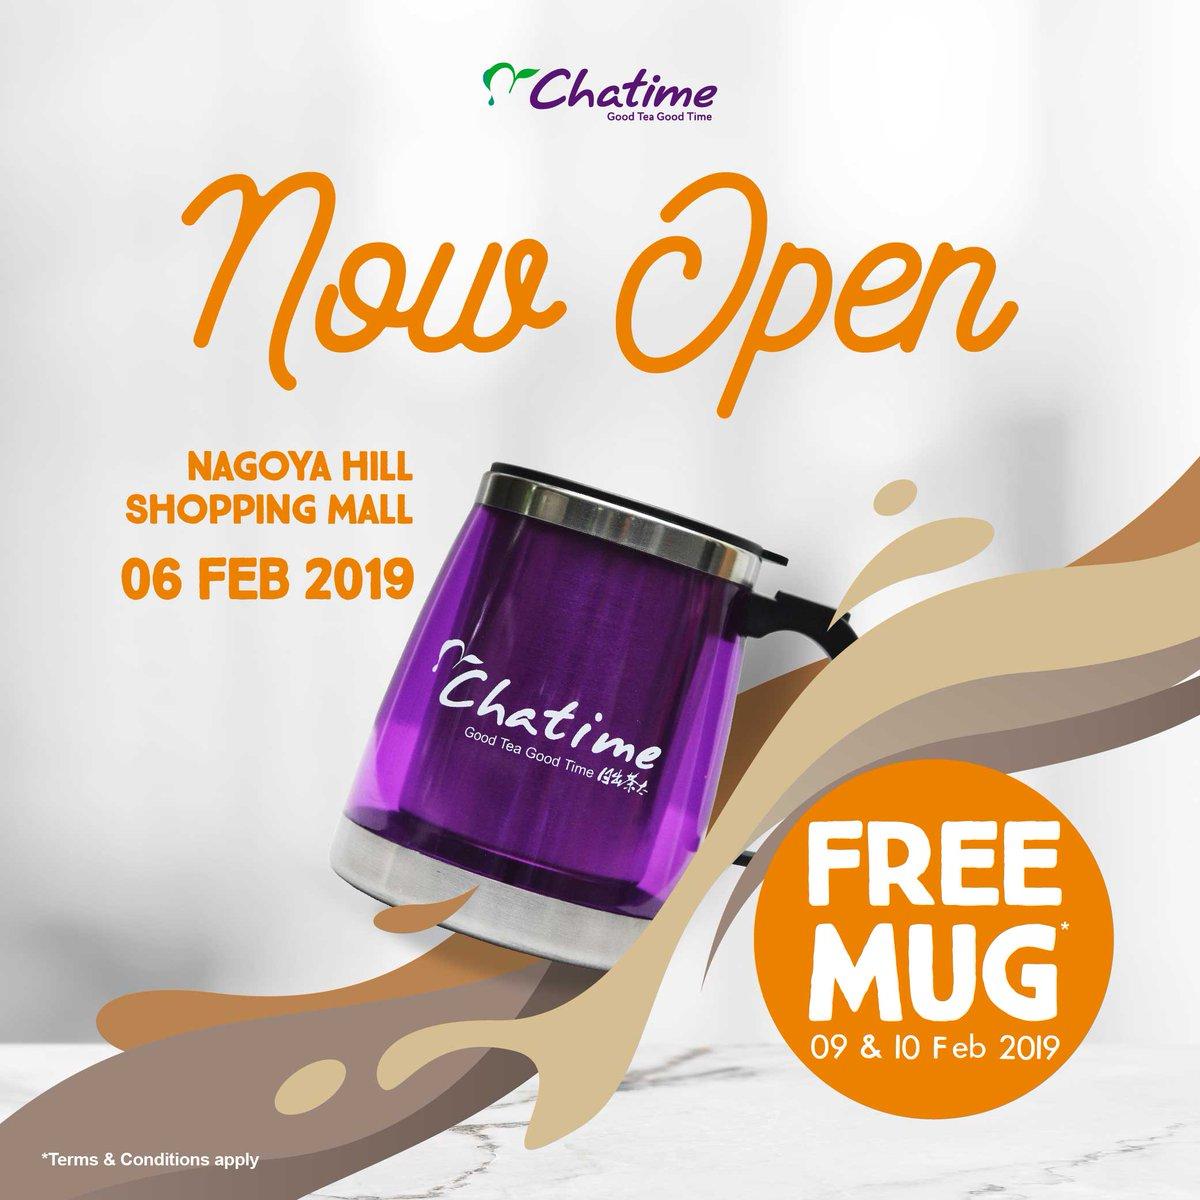 #Chatime - #Promo Opening Batam & Bandung Buy 1 Get 1 Free (s.d 10 Feb 2019)